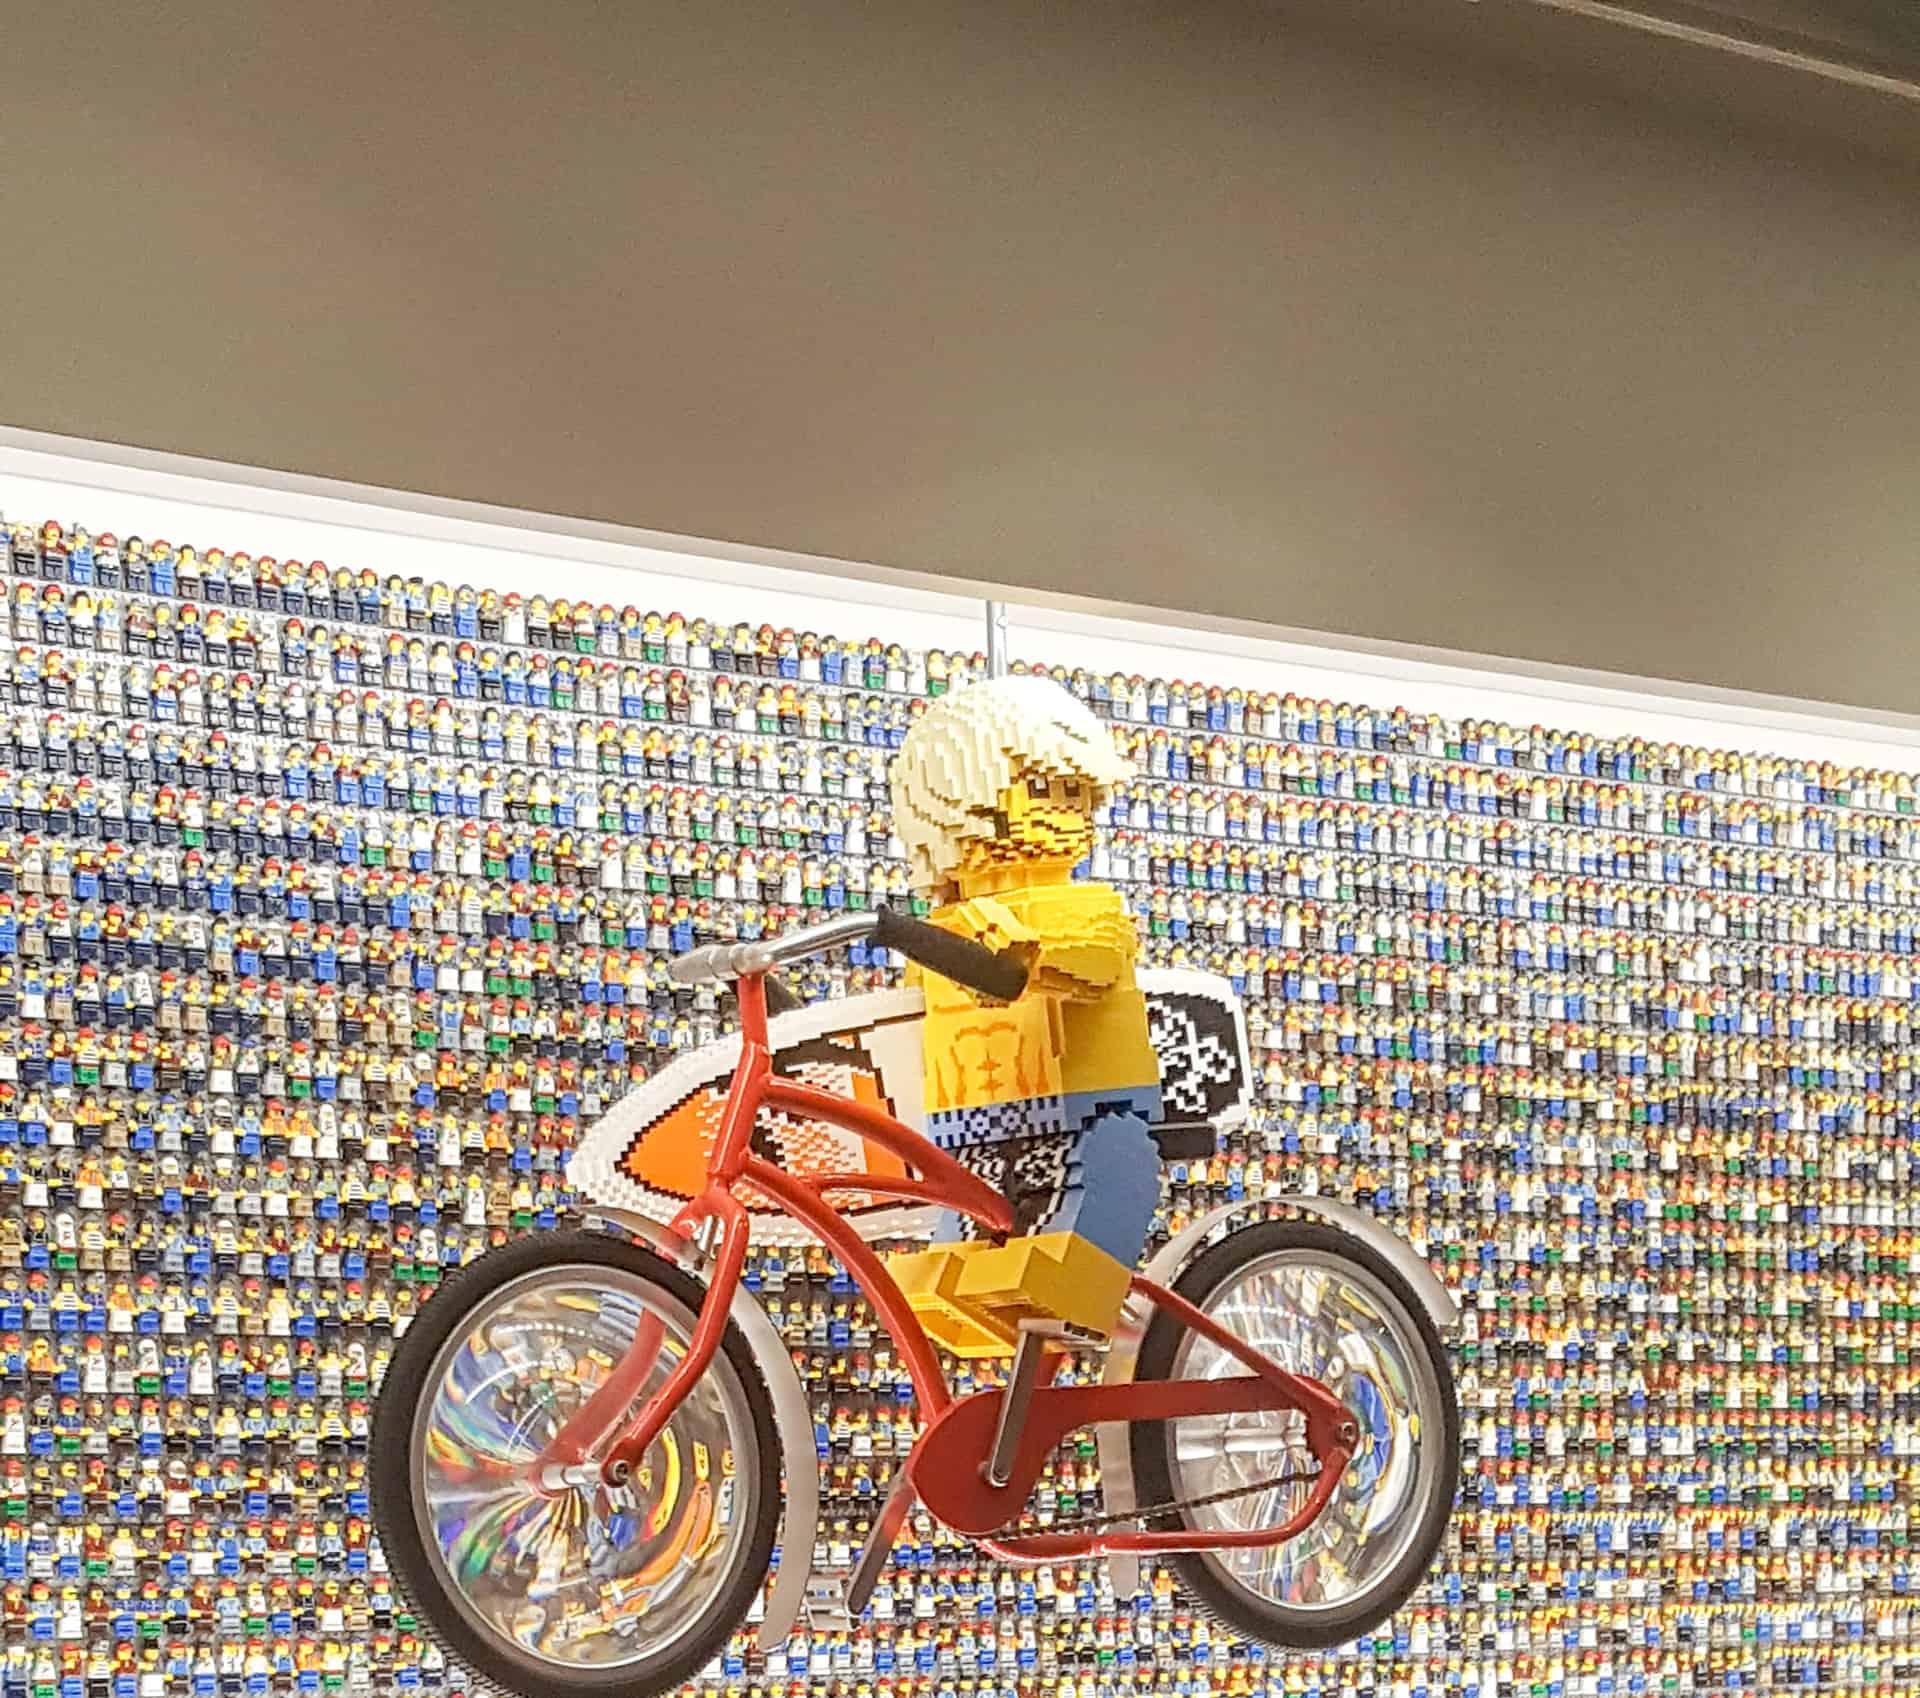 Legoland Florida Hotel Front desk lego minifigure wall